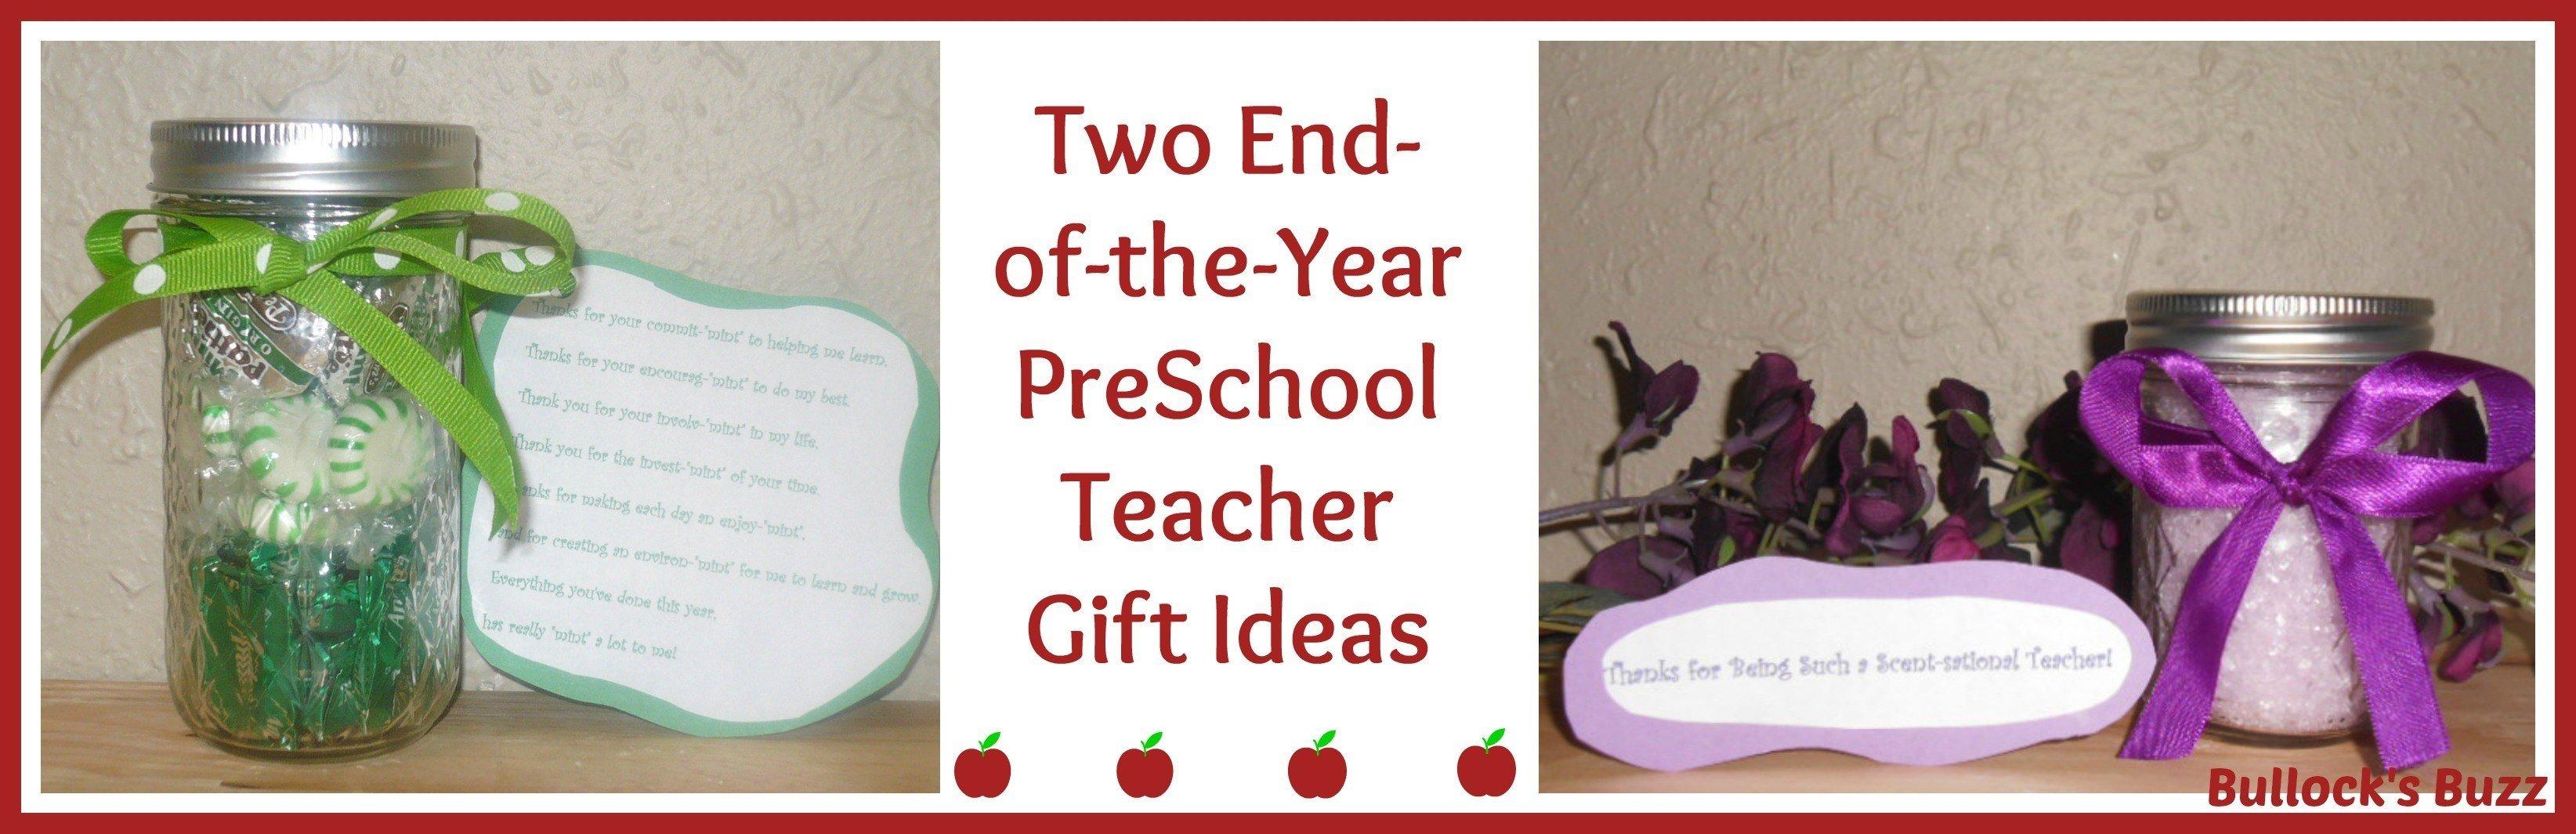 10 Spectacular Gift Ideas For Preschool Teachers two end of the year preschool teacher gift ideas 2021